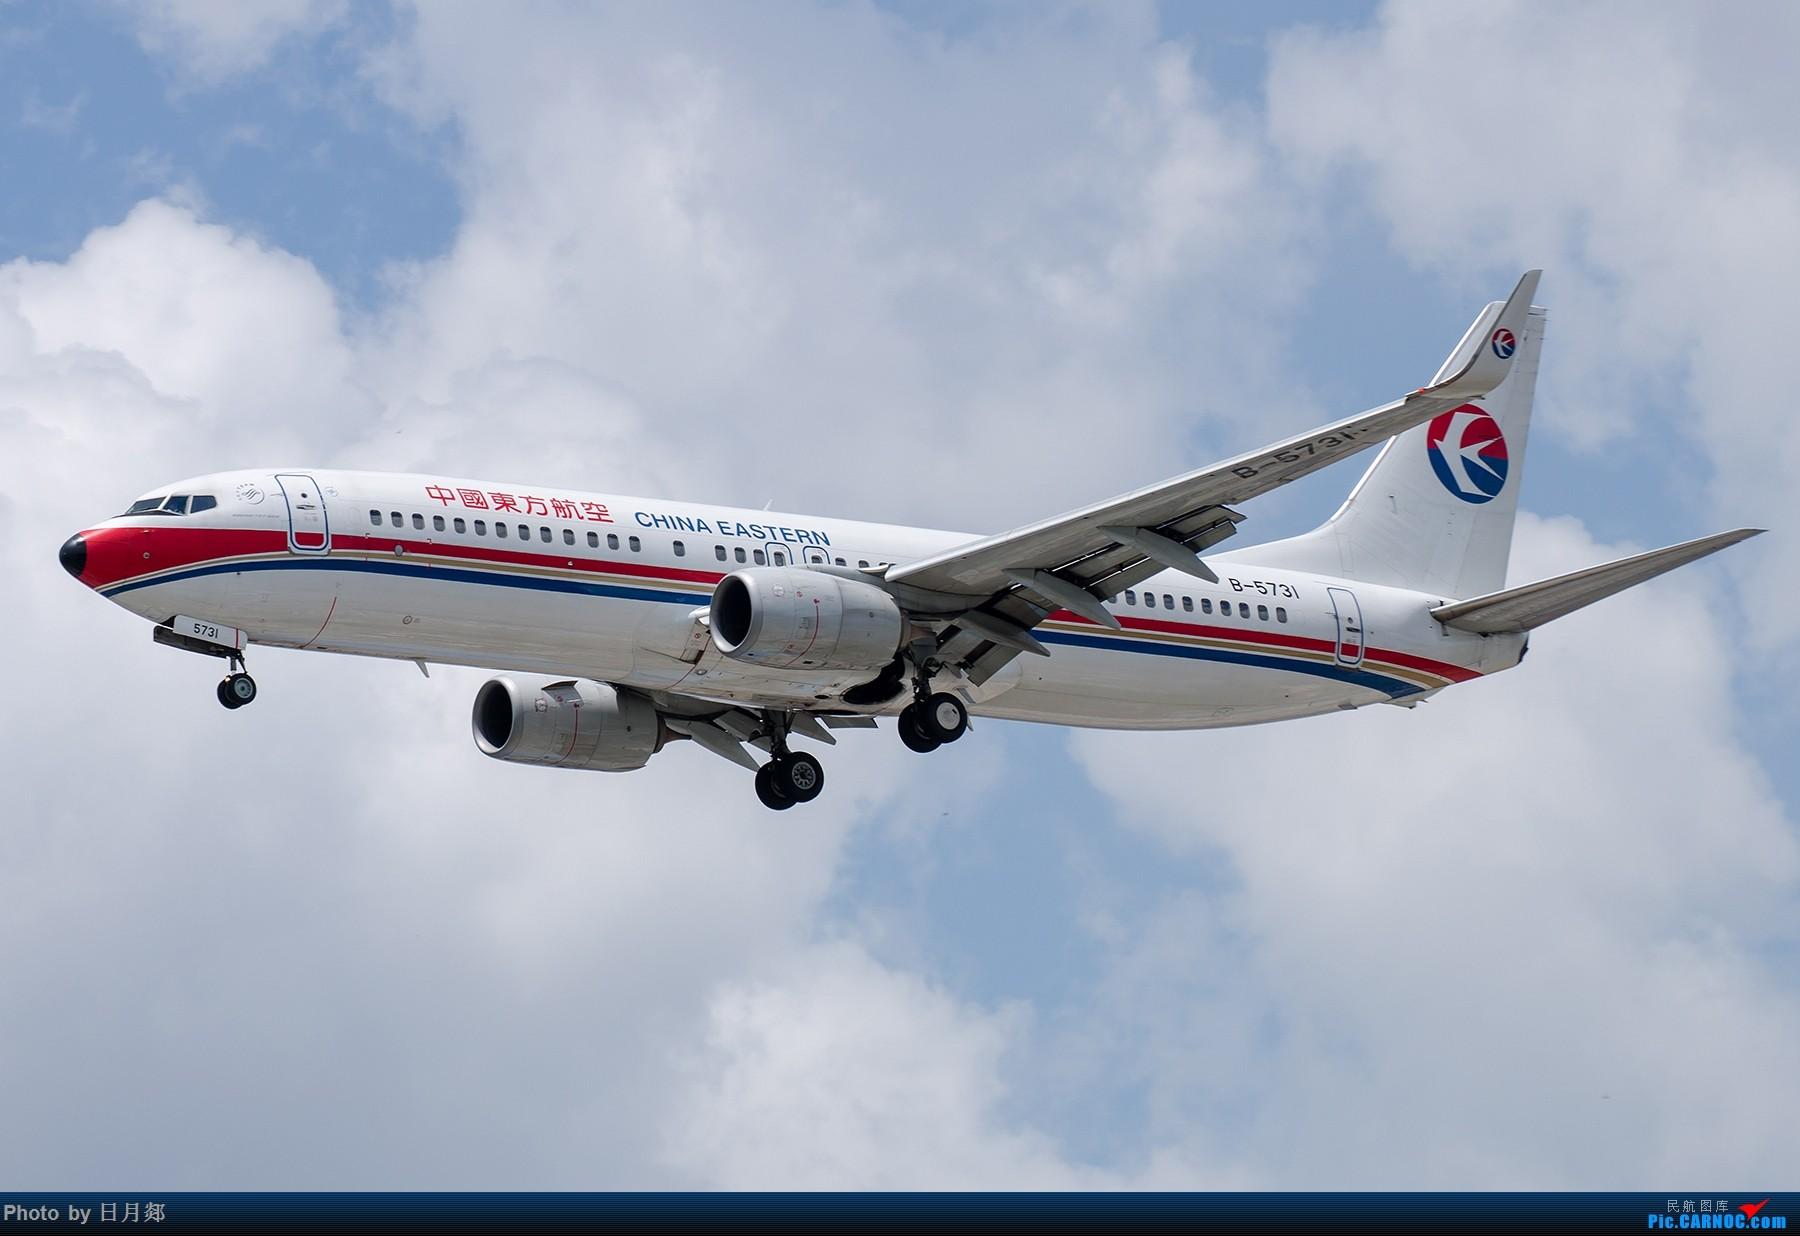 Re:[原创]【SHA拍机*1800大图】图要抓紧发,不然就要炒冷饭,大头镇贴 BOEING 737-800 B-5731 中国上海虹桥国际机场